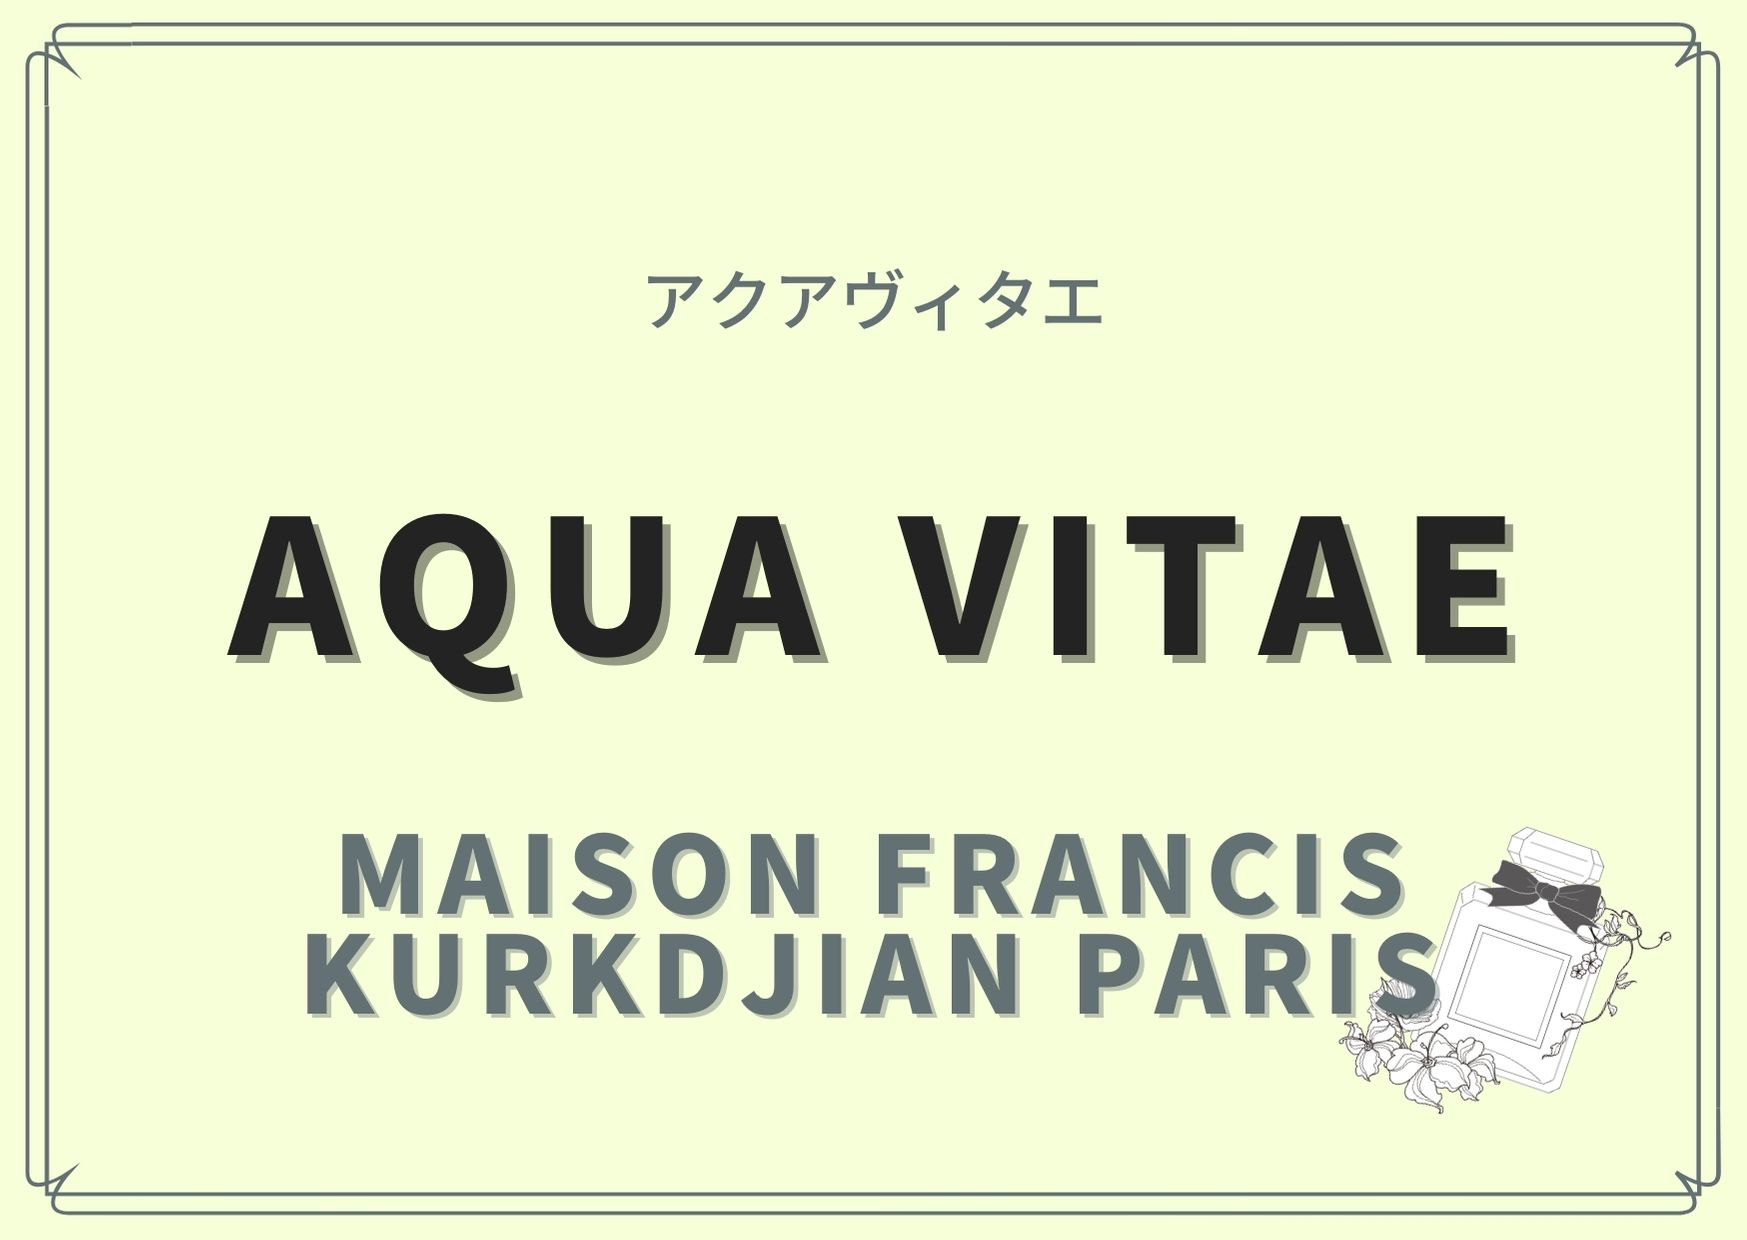 AQUA VITAE(アクアヴィタエ) / Maison Francis Kurkdjian Paris(メゾン フランシス クルジャン)